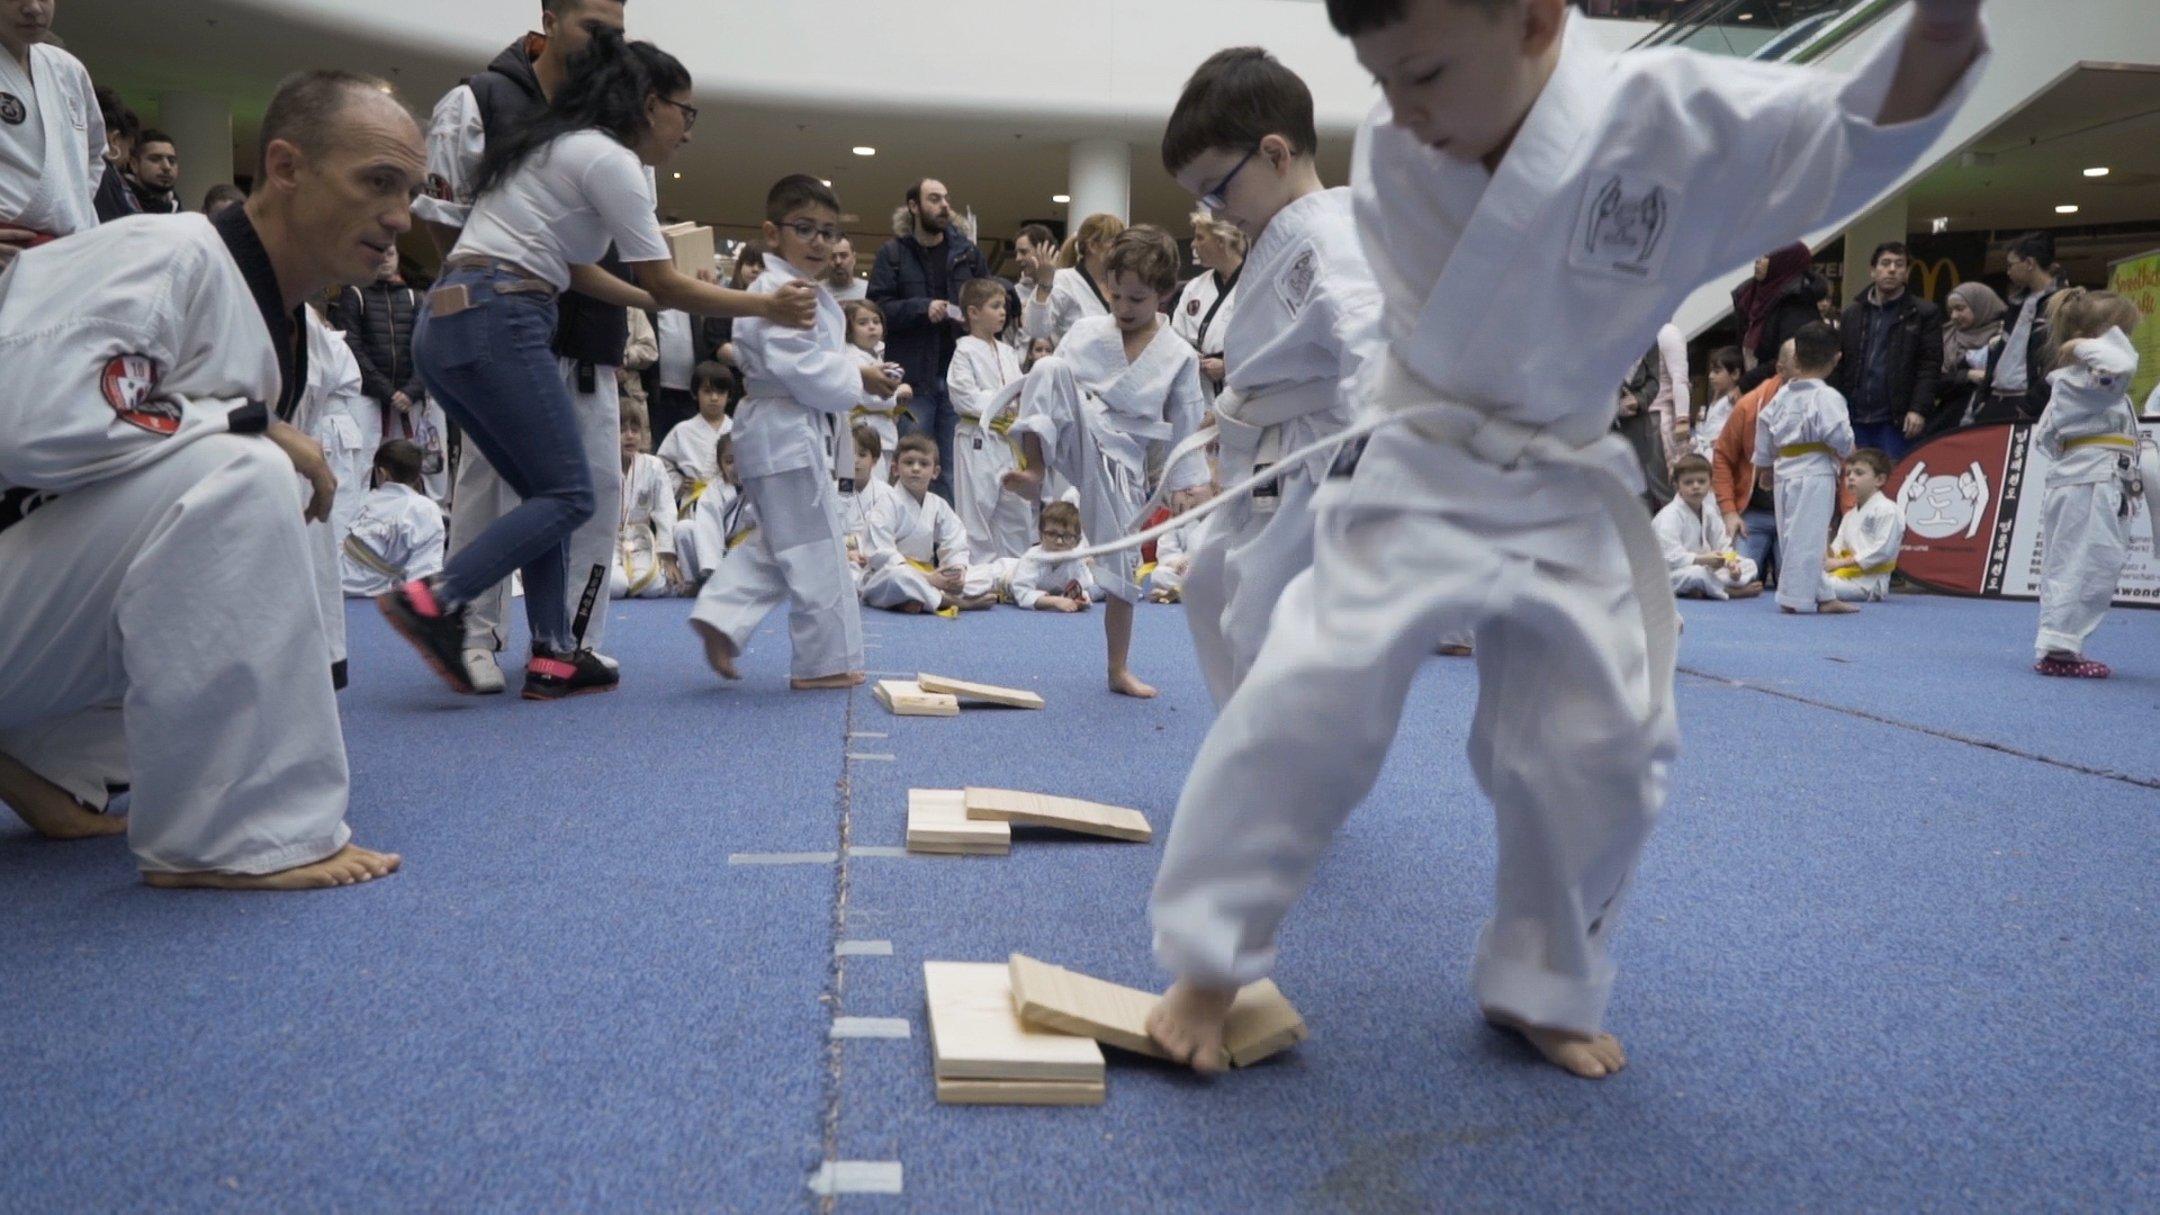 YOUNG-UNG Taekwondo Kampfsport Turnier